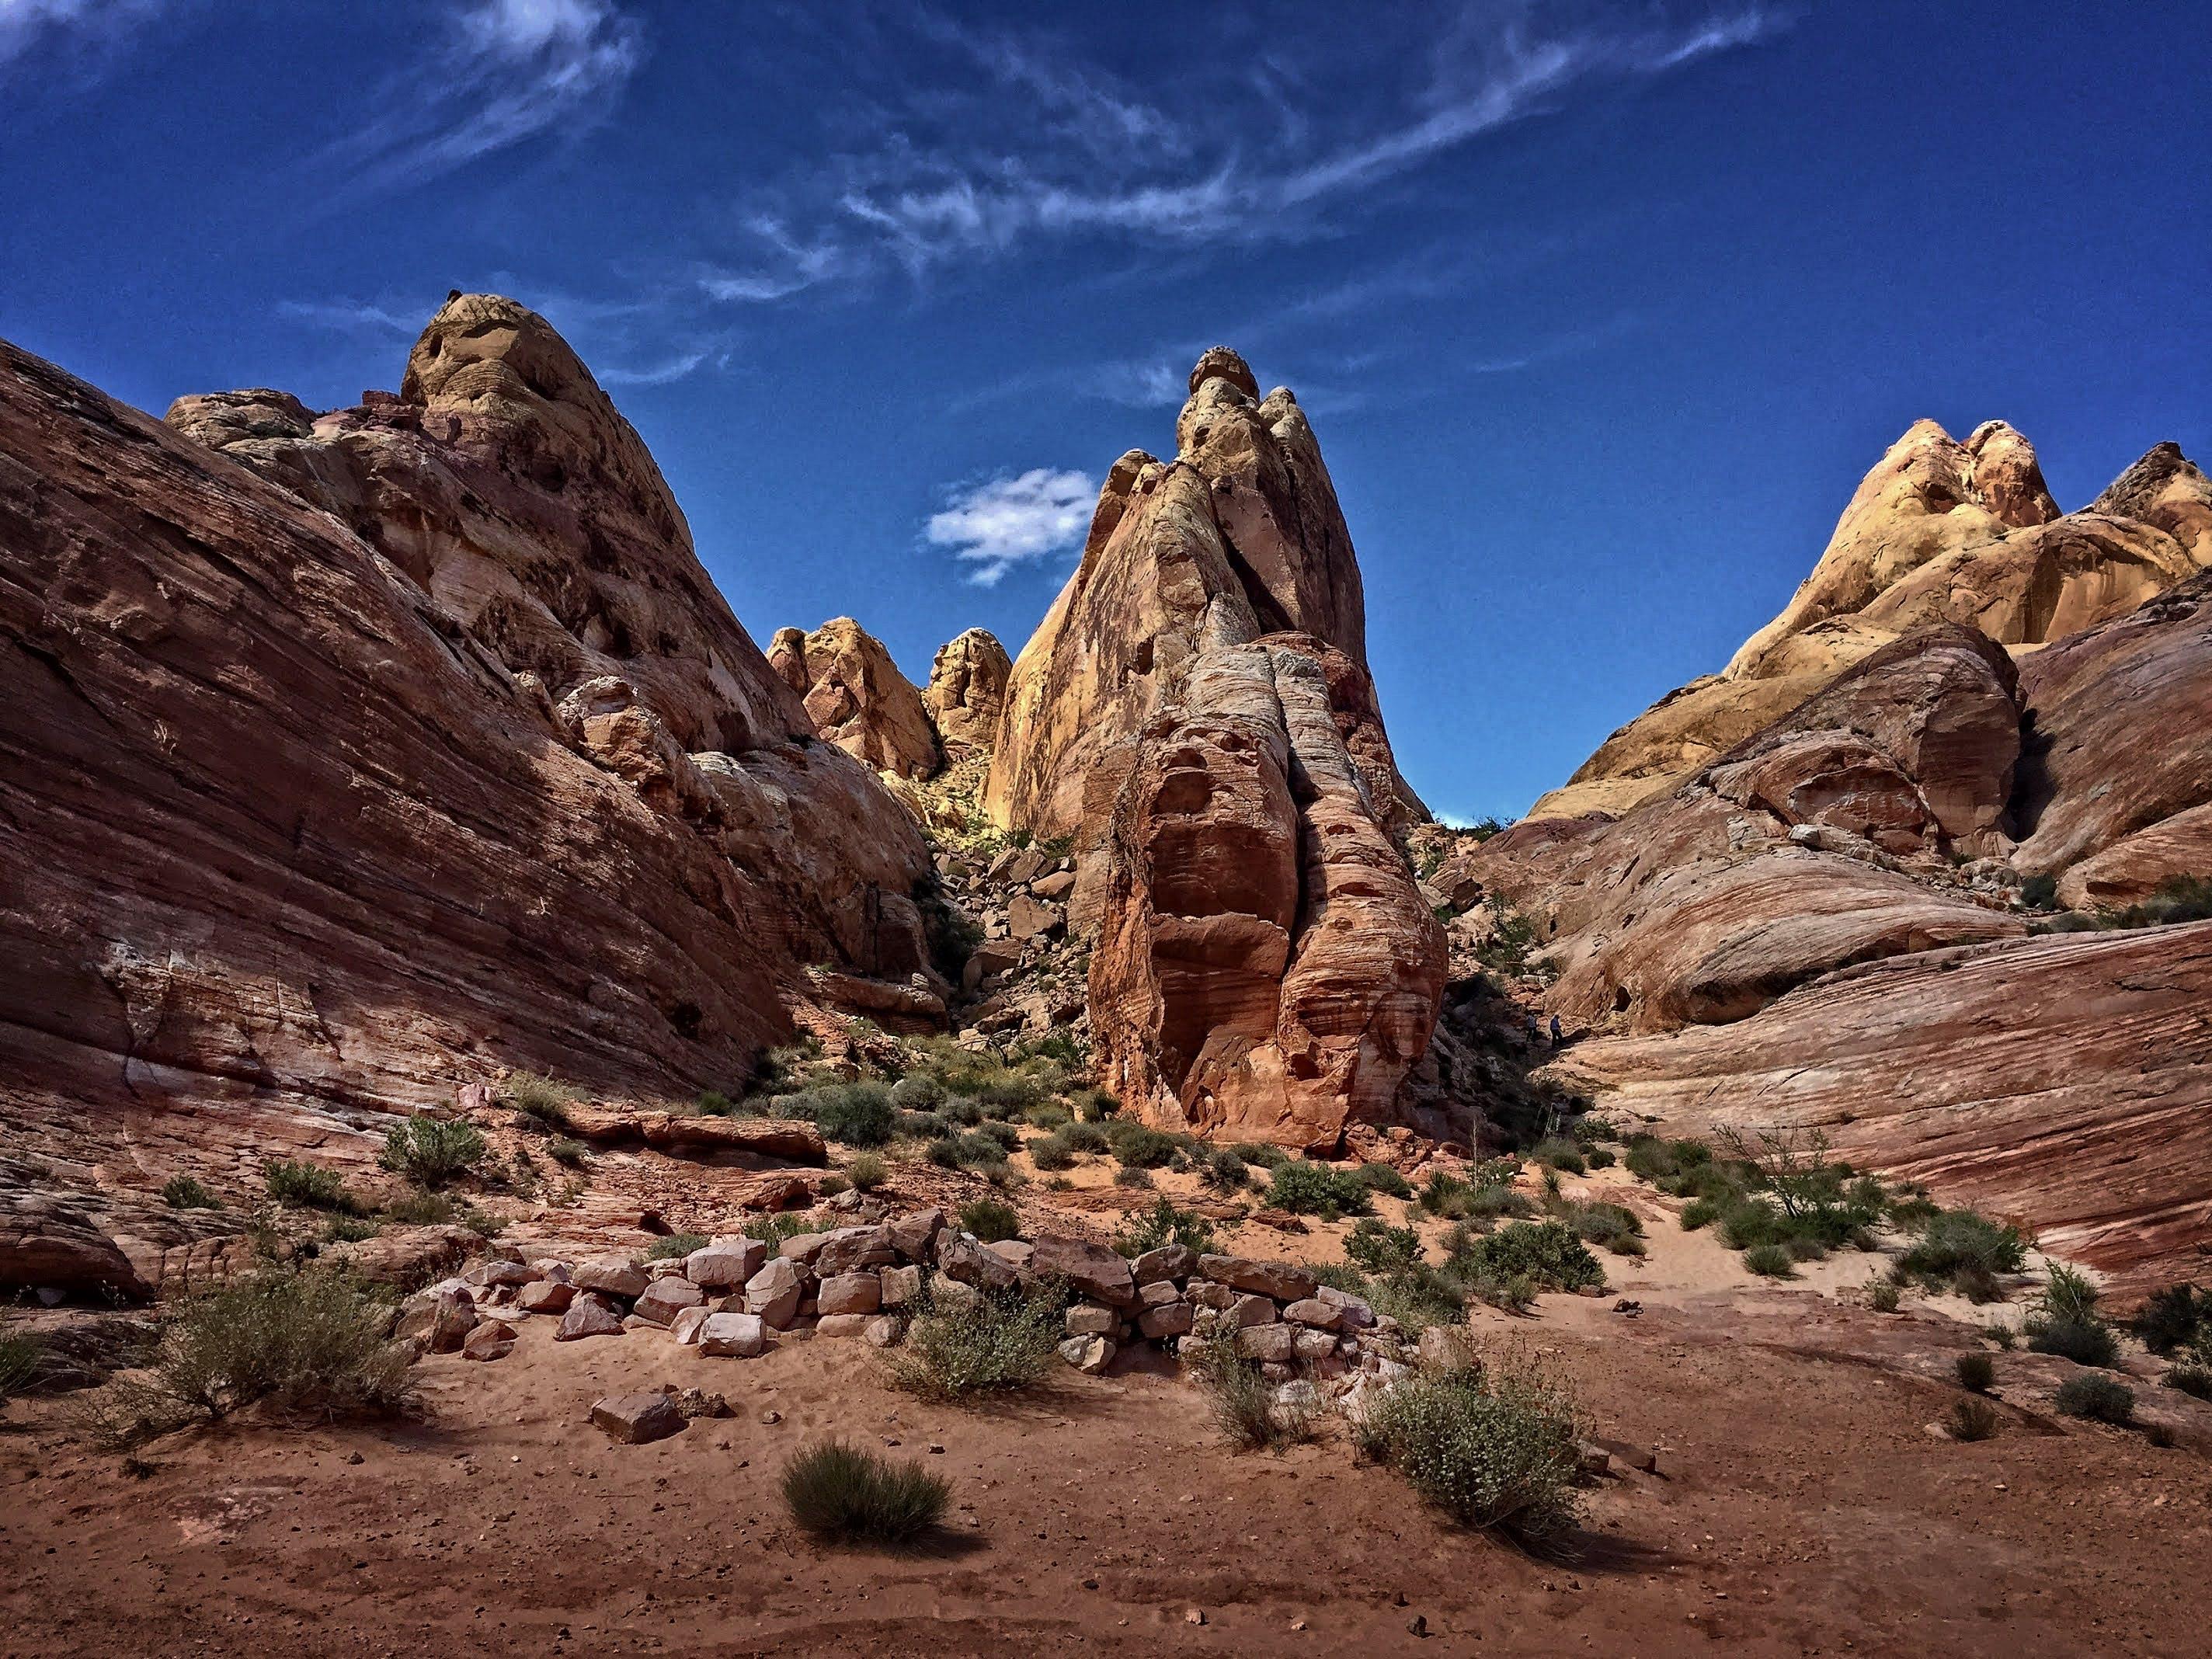 Kostenloses Stock Foto zu berg, blauer himmel, canyon, felsen